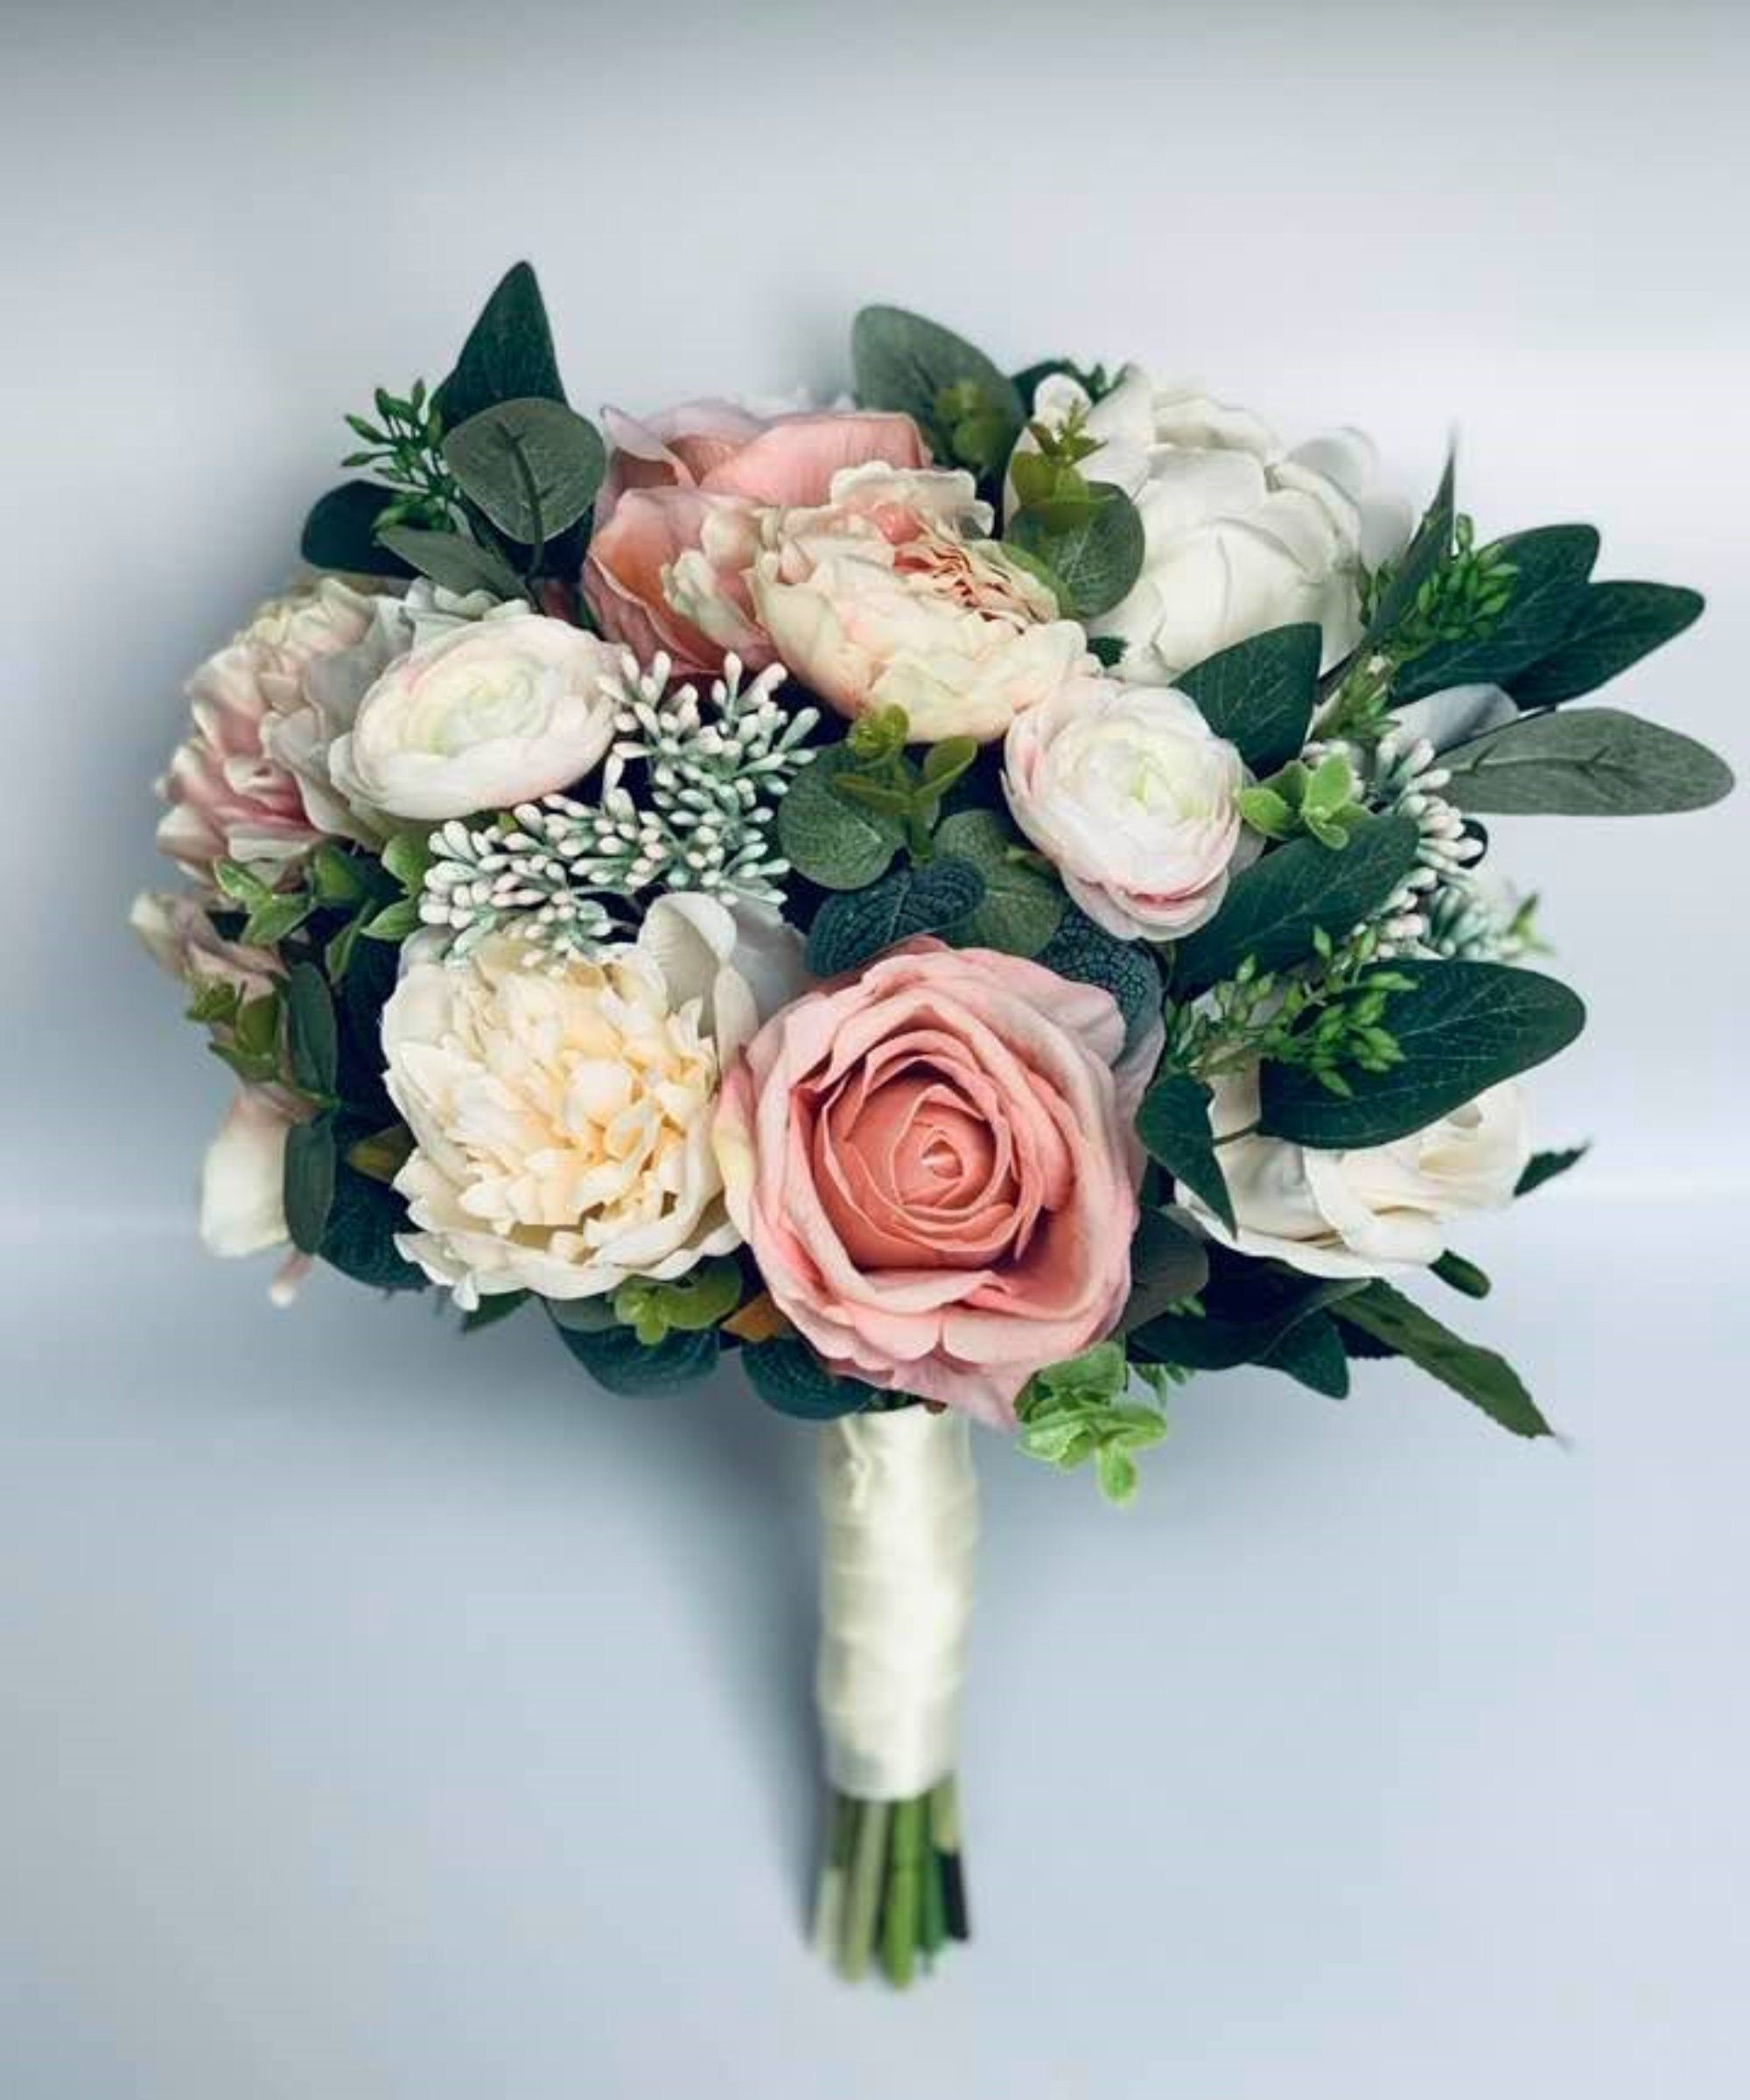 Stella Artificial Pink Peach Bridal Wedding Bouquet Blush Pink Silk Flower Bouquet Rus Artificial Wedding Bouquets Rustic Bridal Bouquets Silk Flowers Wedding